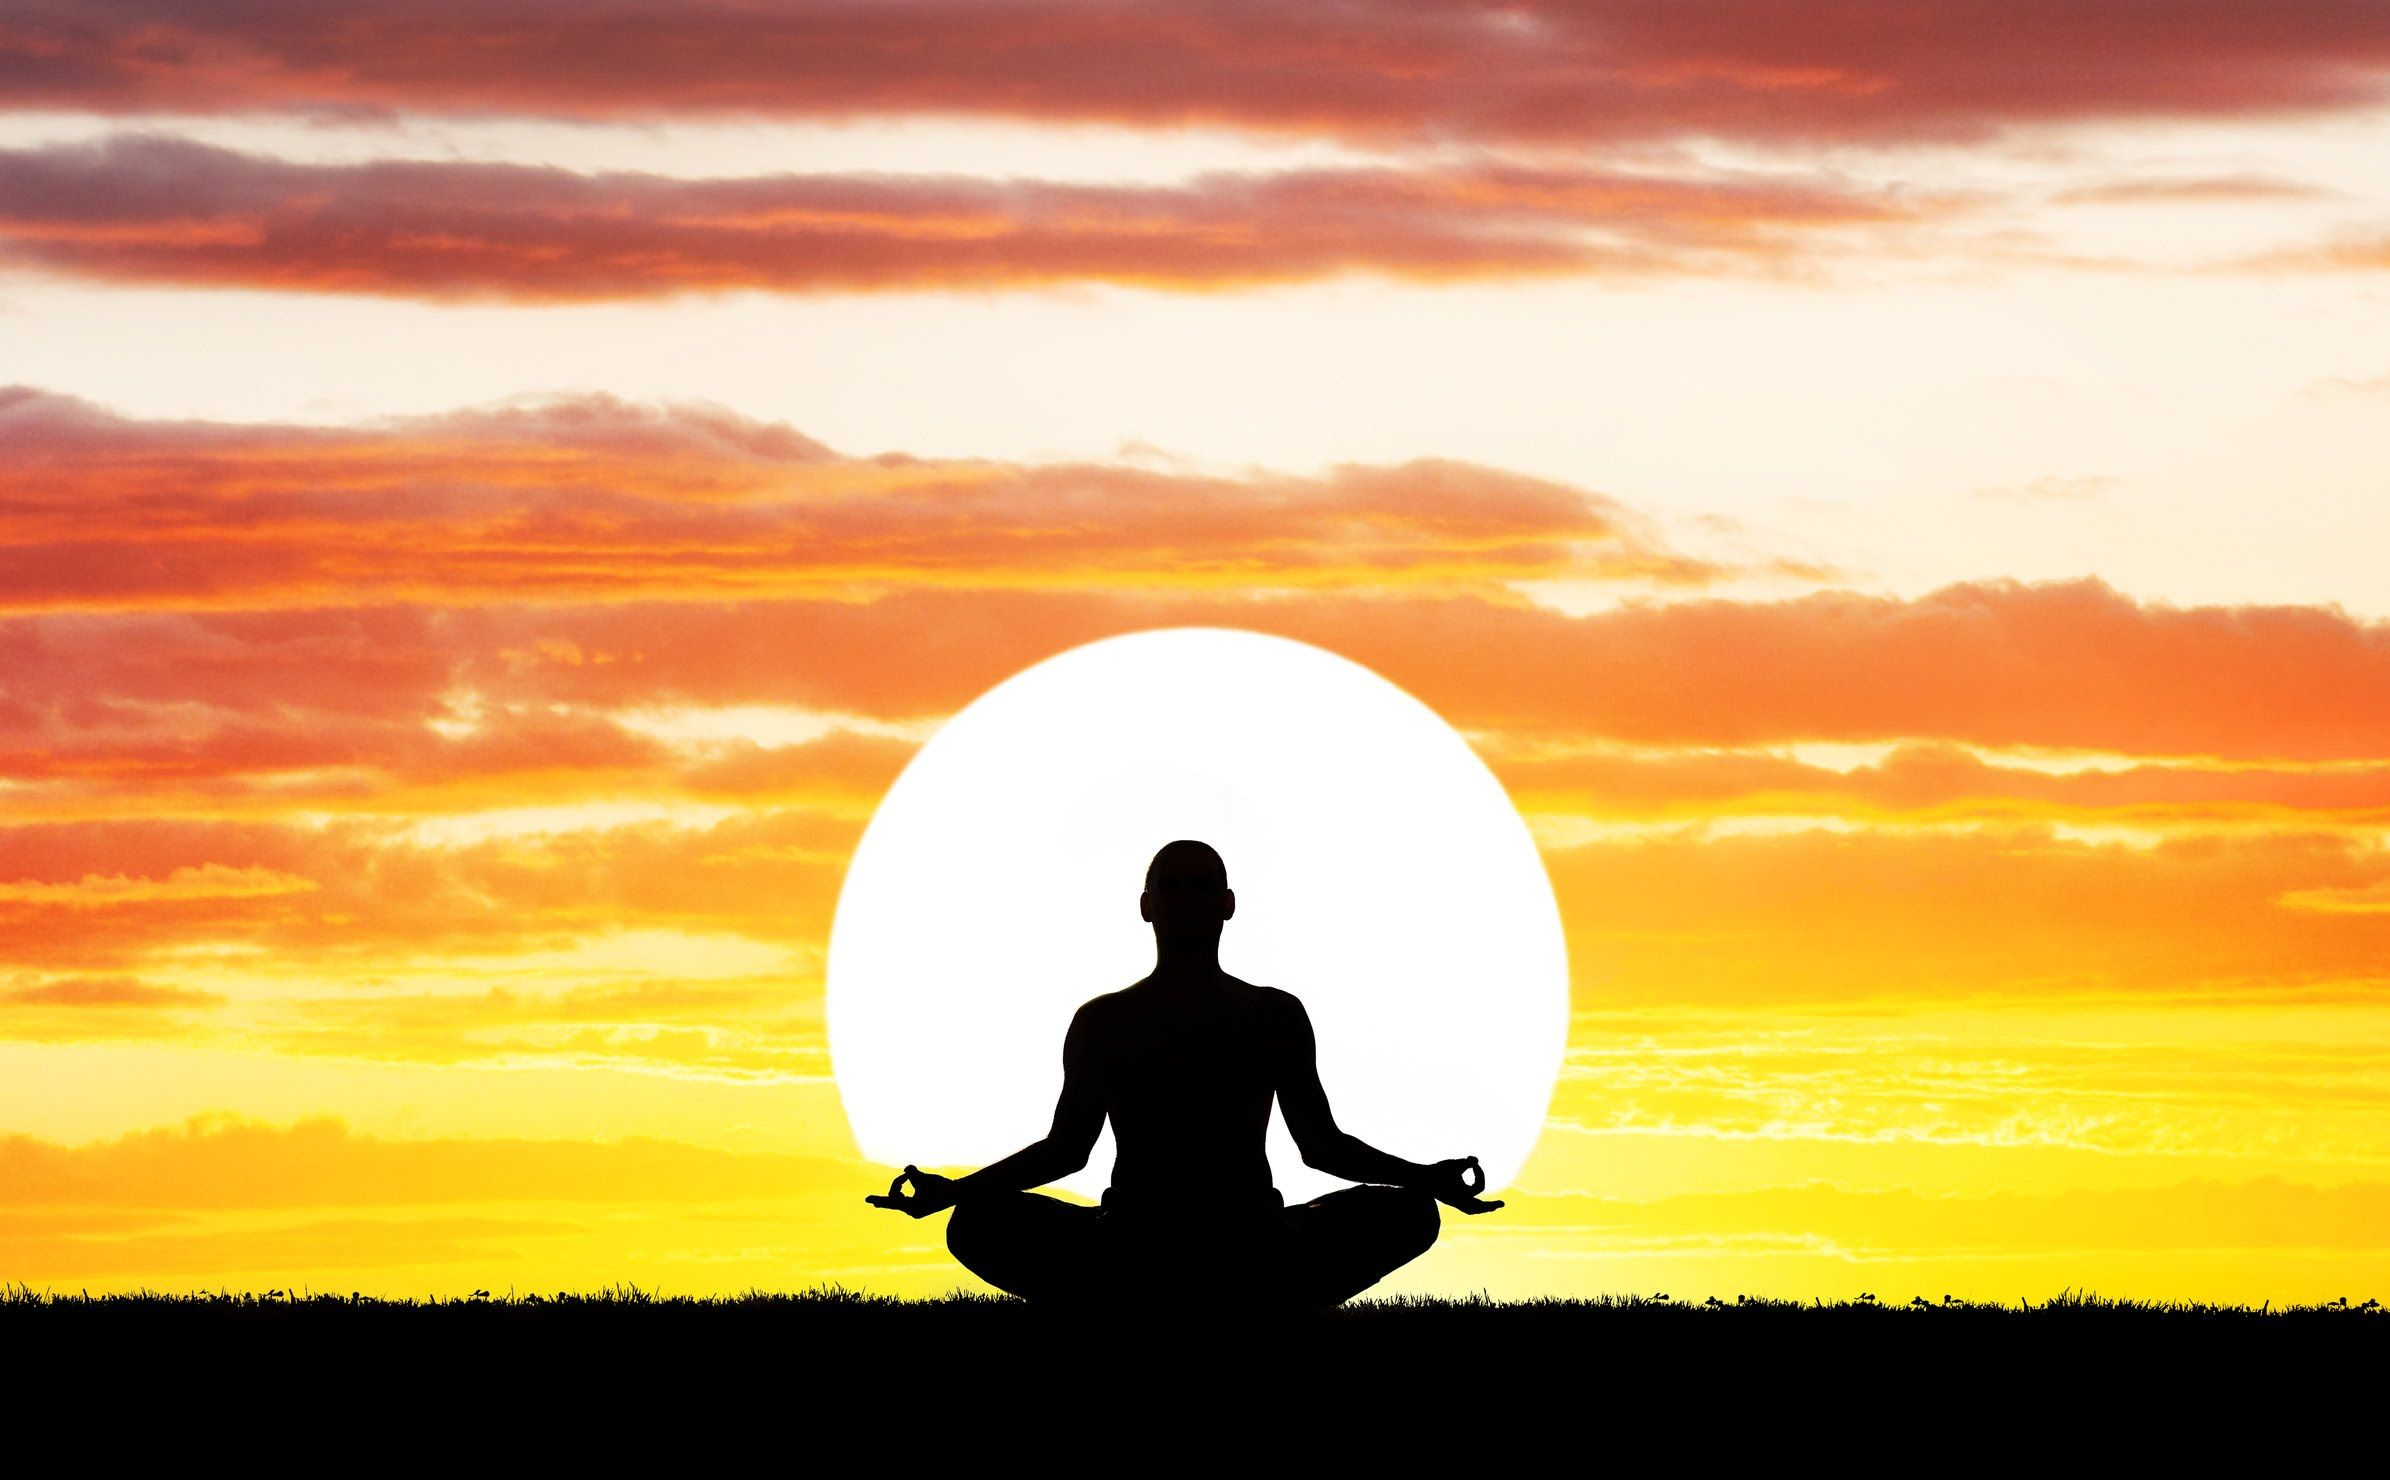 3 Hour Meditation Music Healing Music, Relax Mind Body